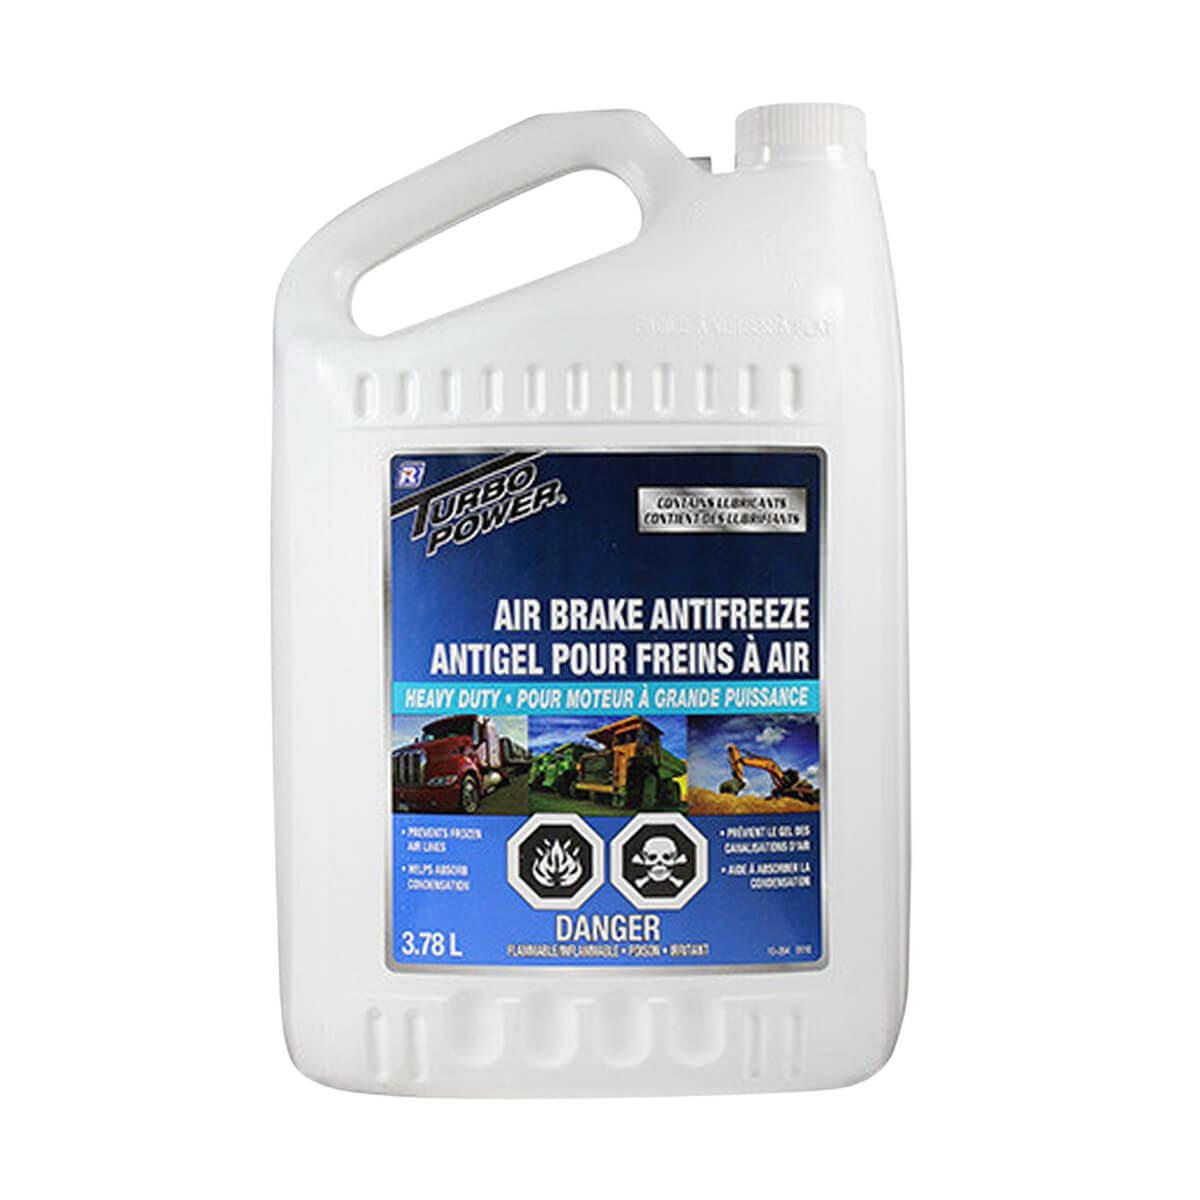 Air Brake Antifreeze - 3.78 litre